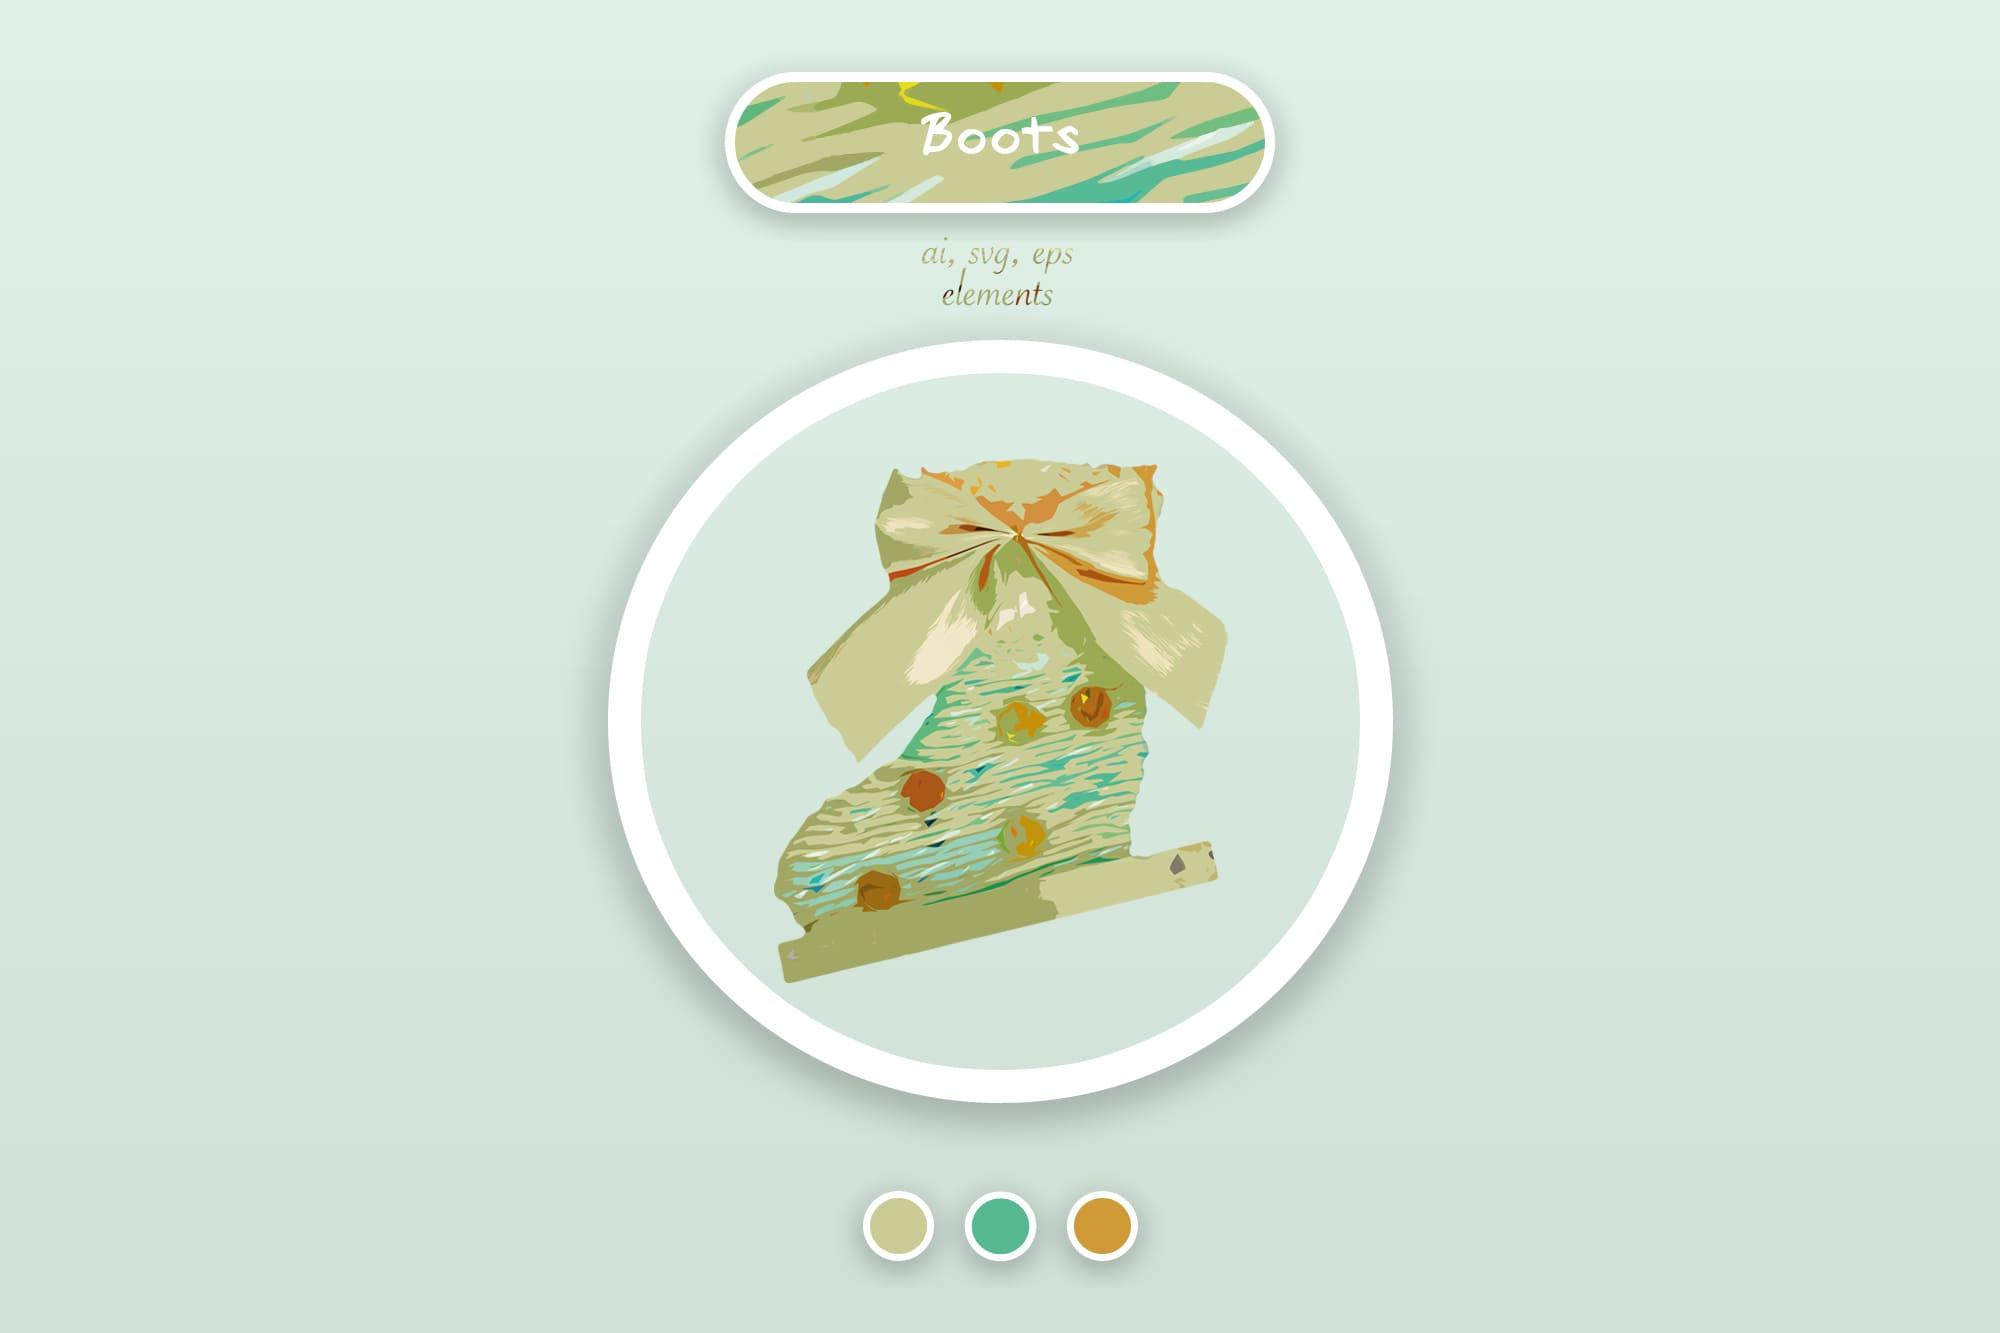 496 Christmas Illustrations: Christmas Vectors Bundle SVG, EPS, AI - Boots a